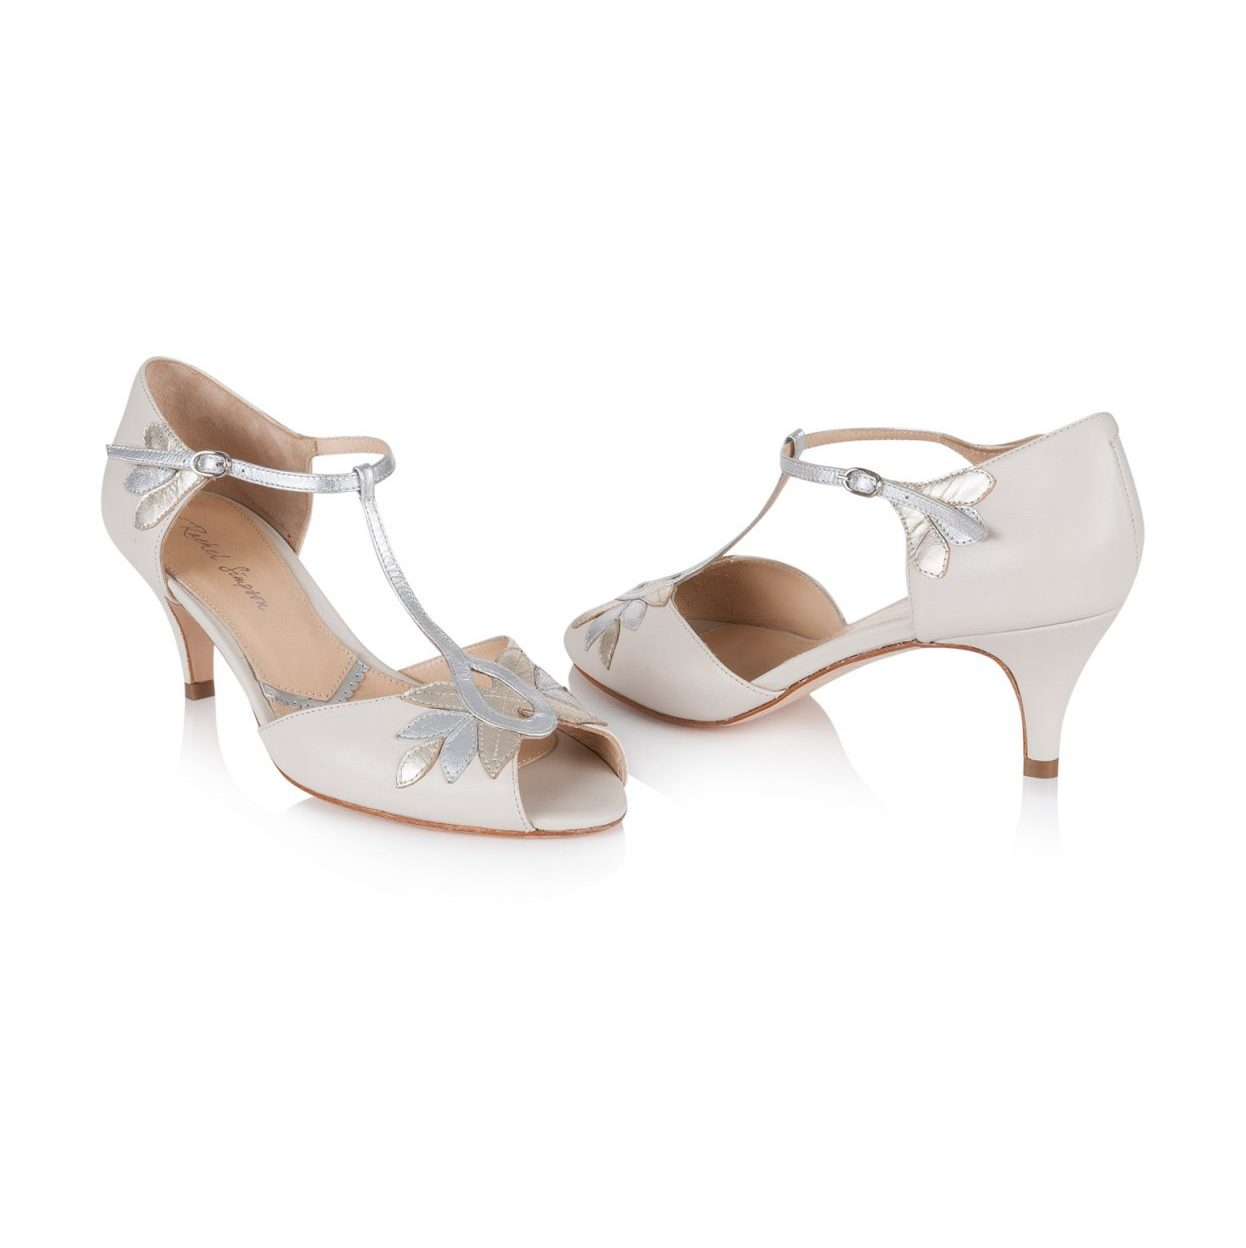 Rachel Simpson France chaussures de mariee ivoire chaussures mariage chaussure vintage